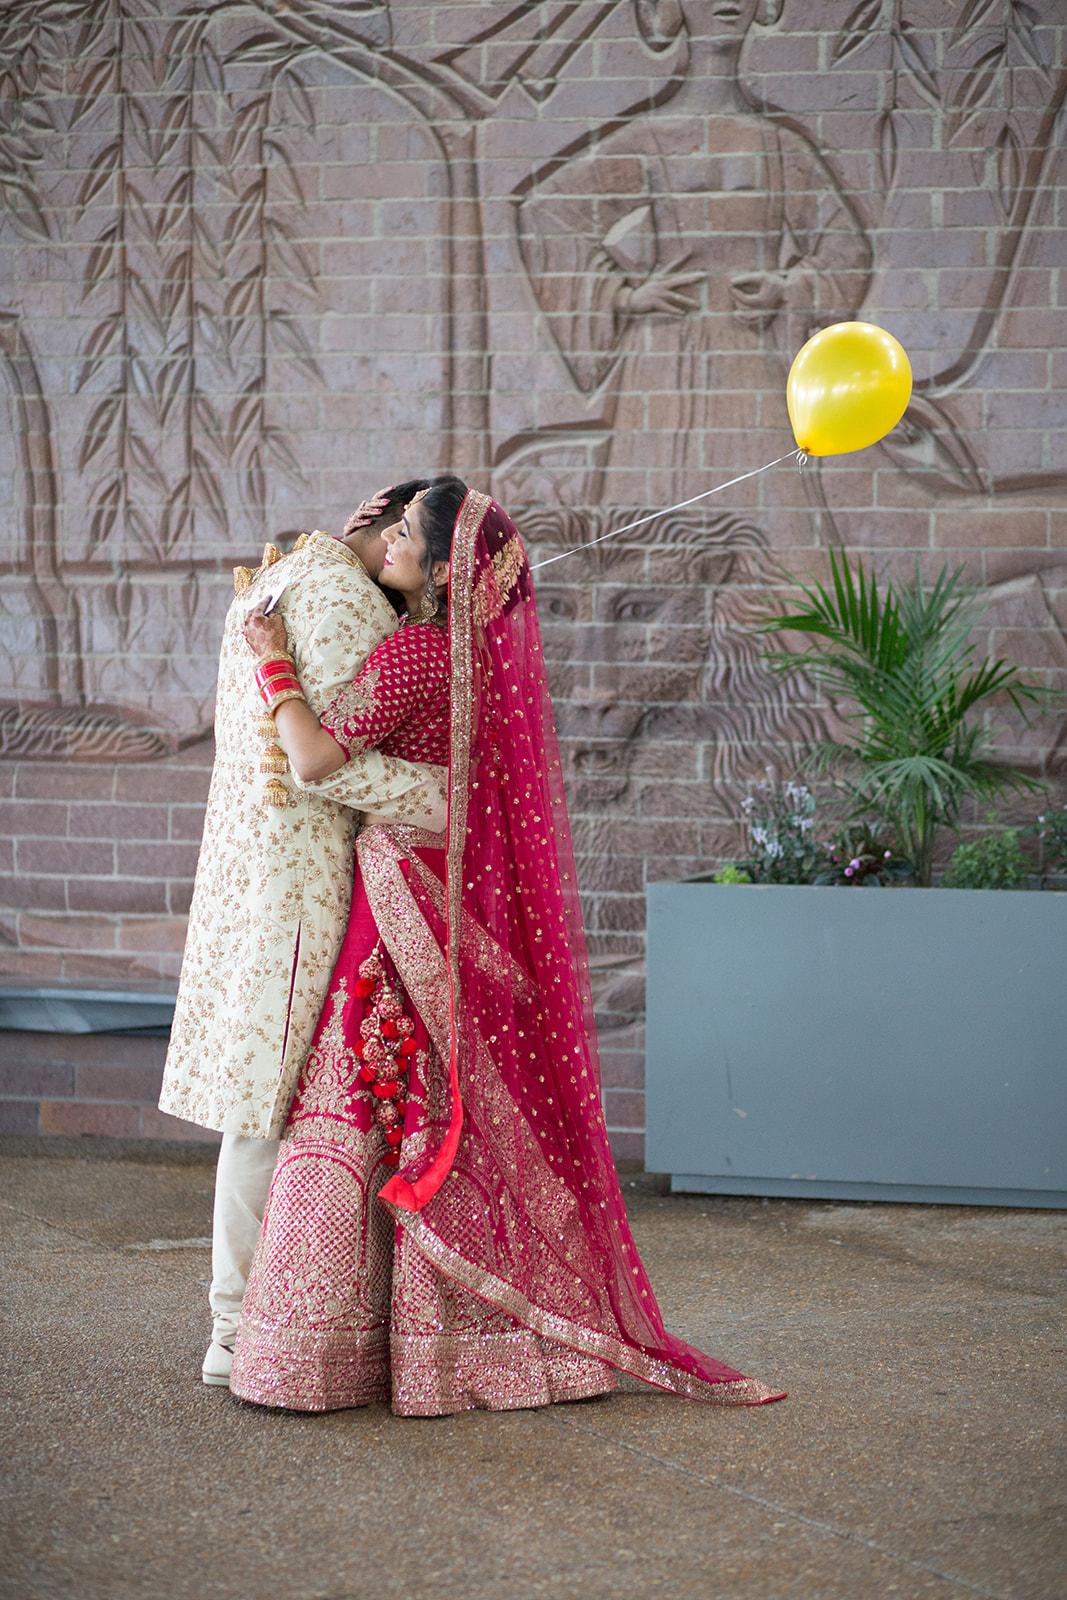 Le Cape Weddings - South Asian Wedding Sumeet and Chhavi - First Look S-9.jpg